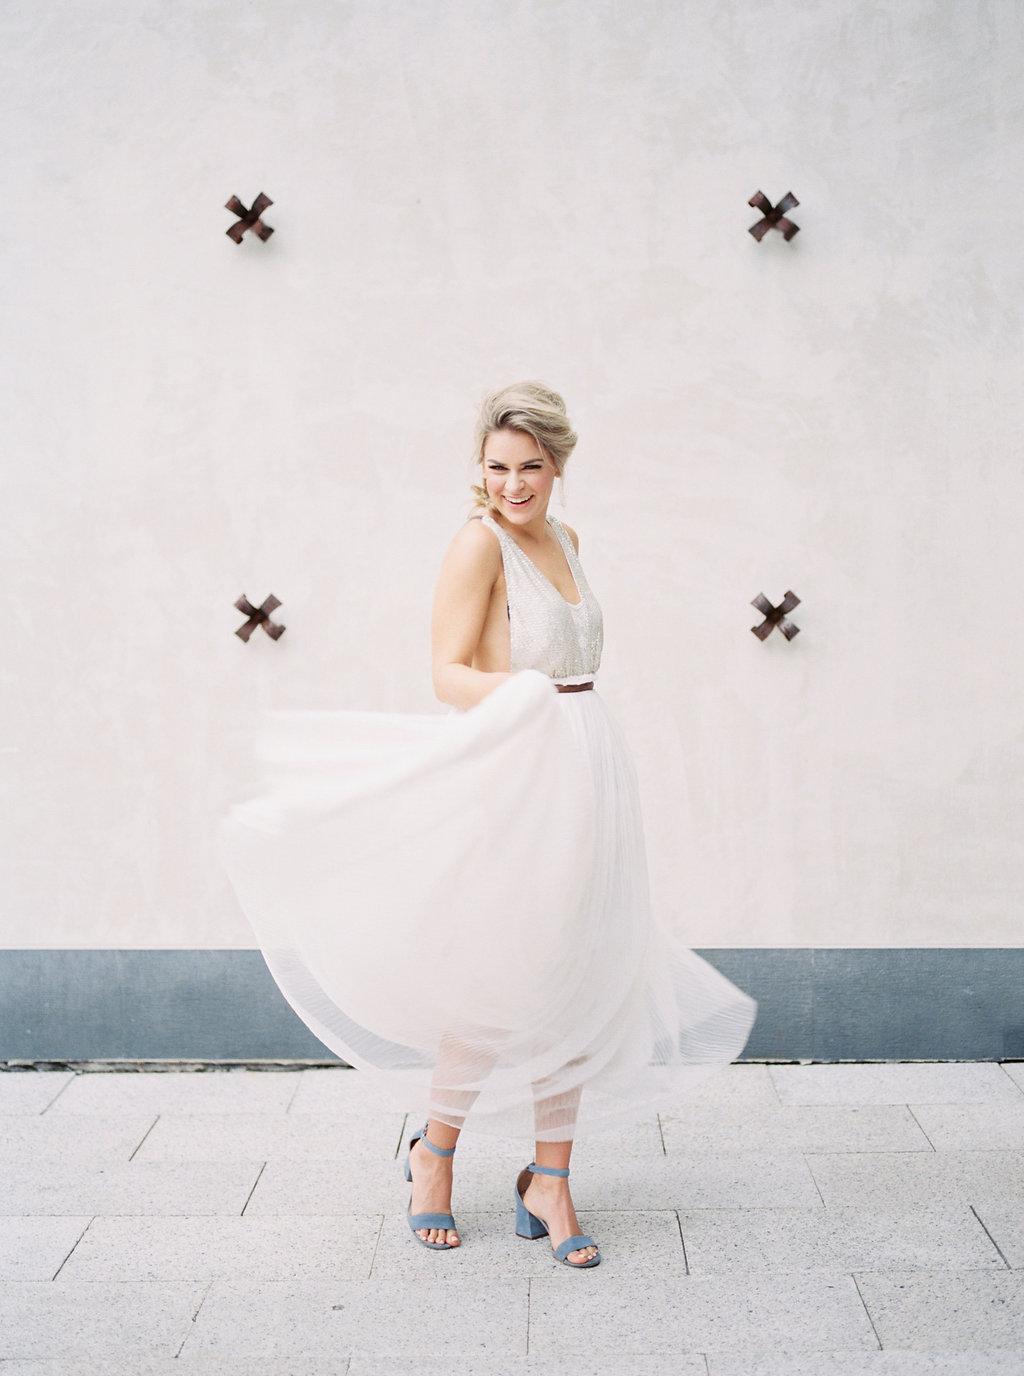 wedding inspiration shoots - photo by Awake Photography http://ruffledblog.com/sweet-peony-bridal-inspiration